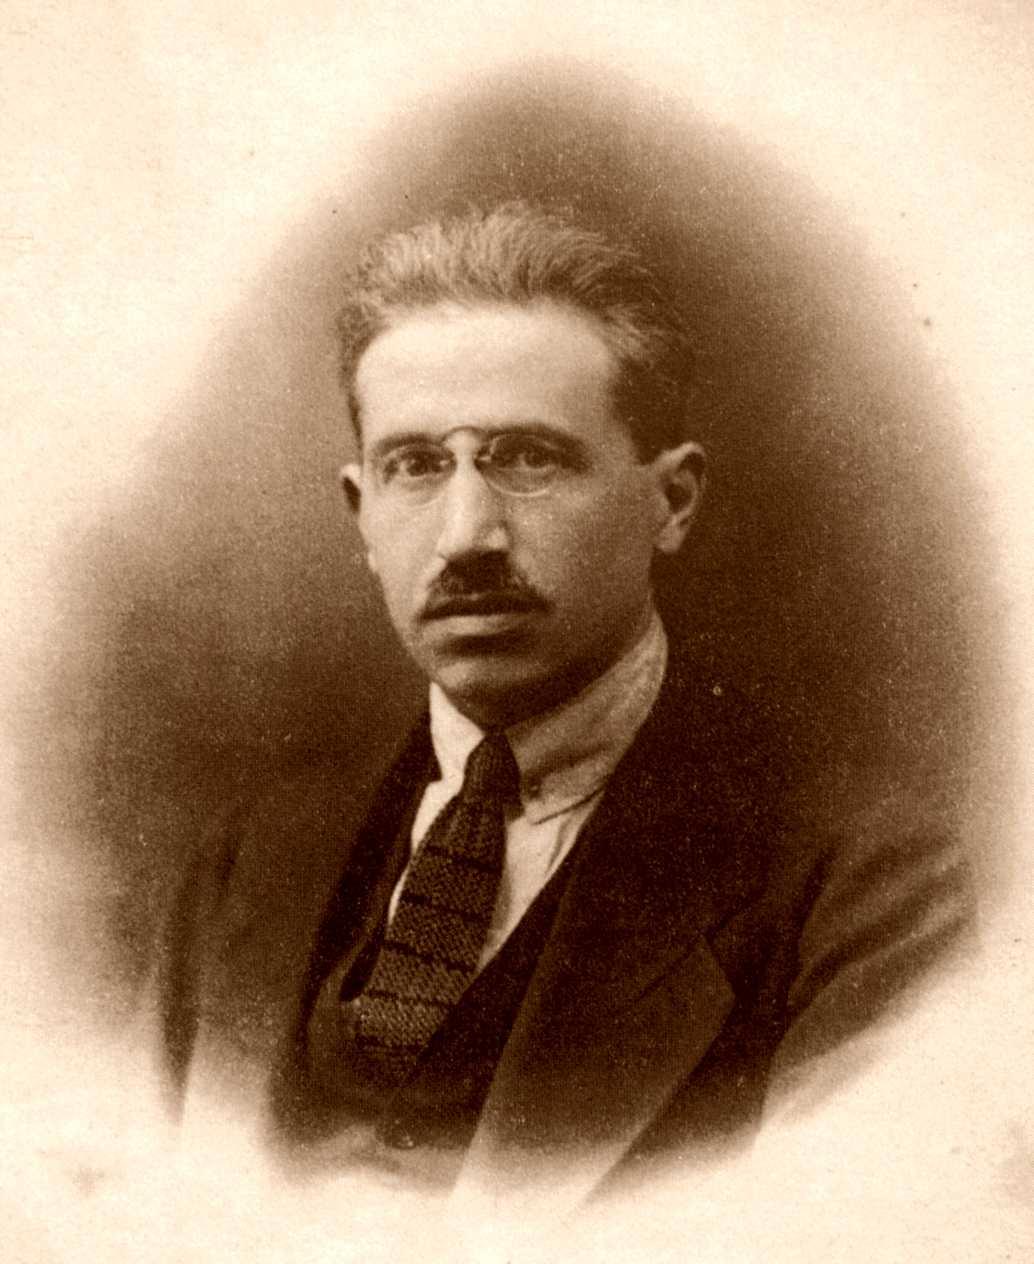 Carlo Frigerio